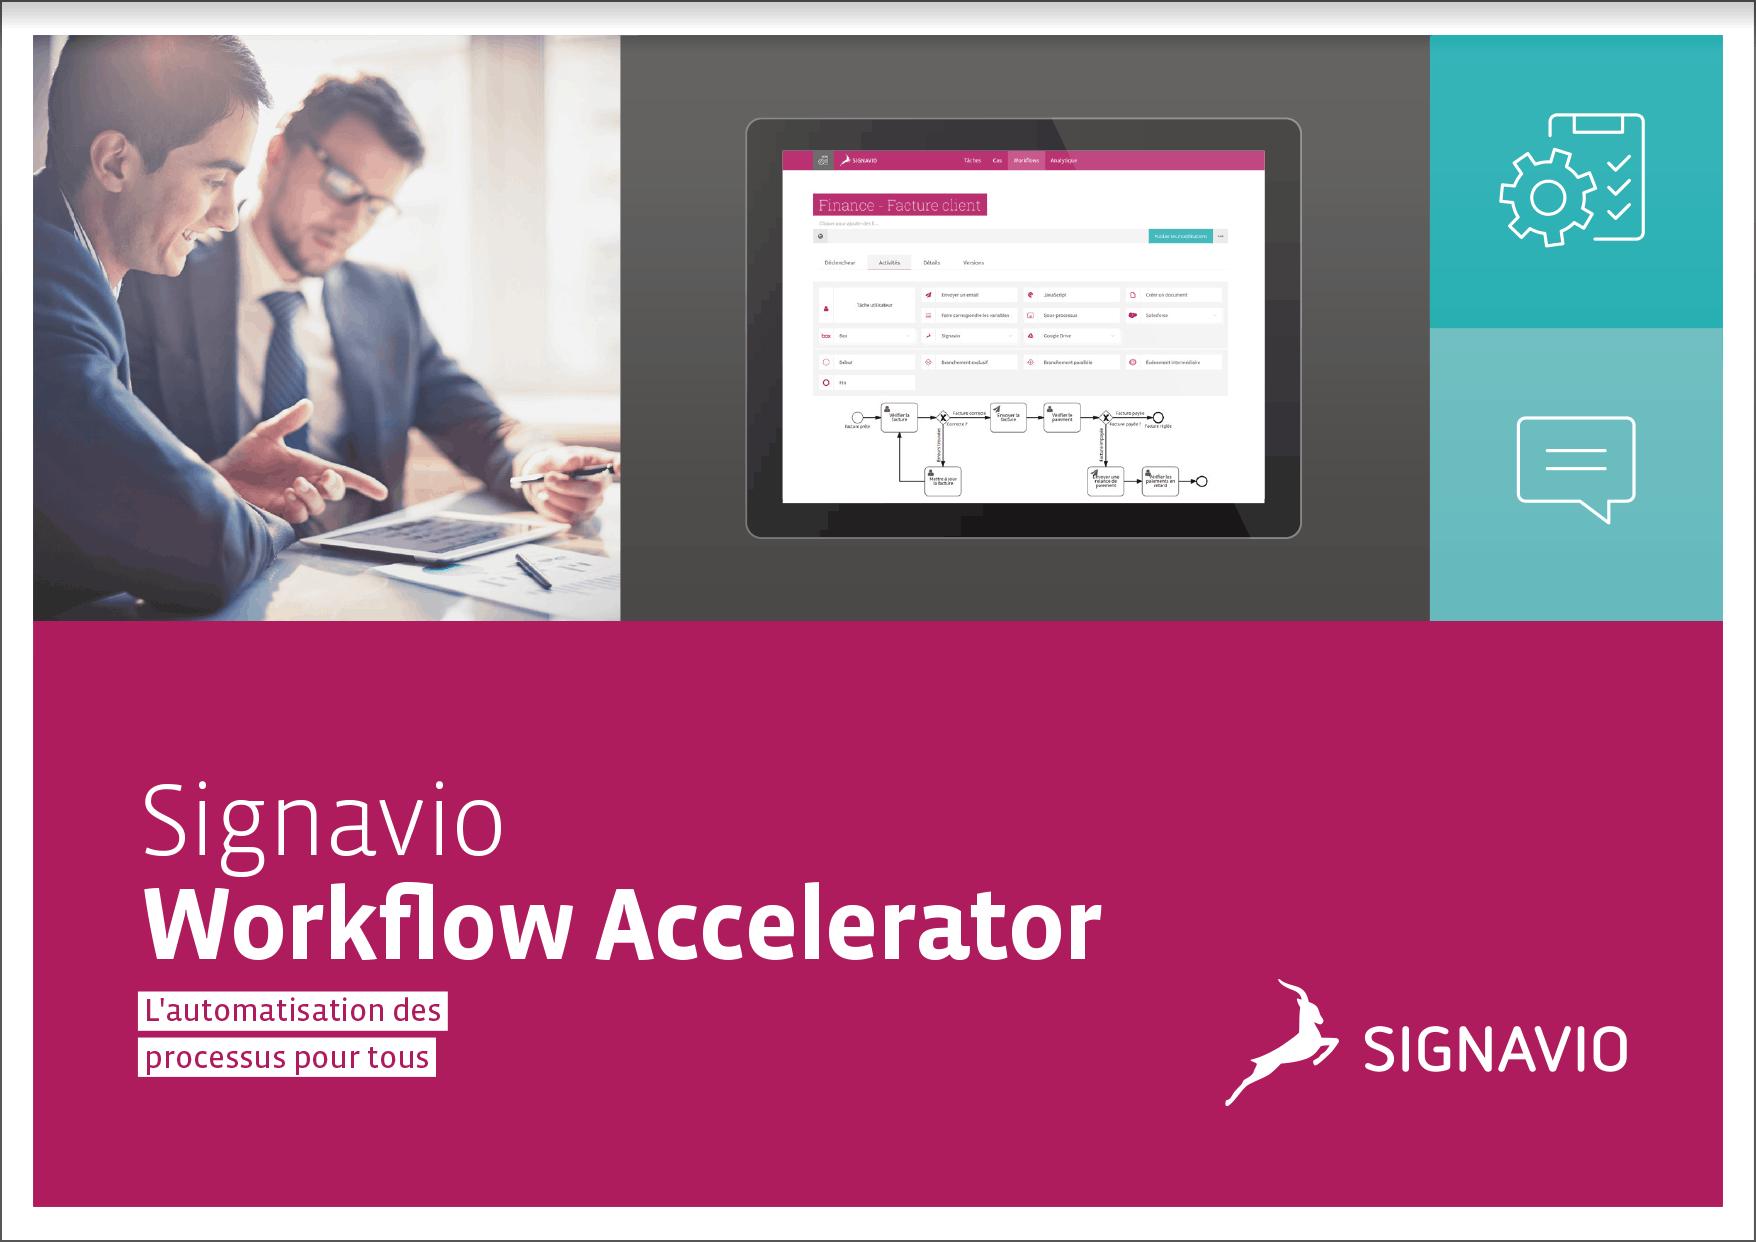 Signavio Workflow Accelerator Preview